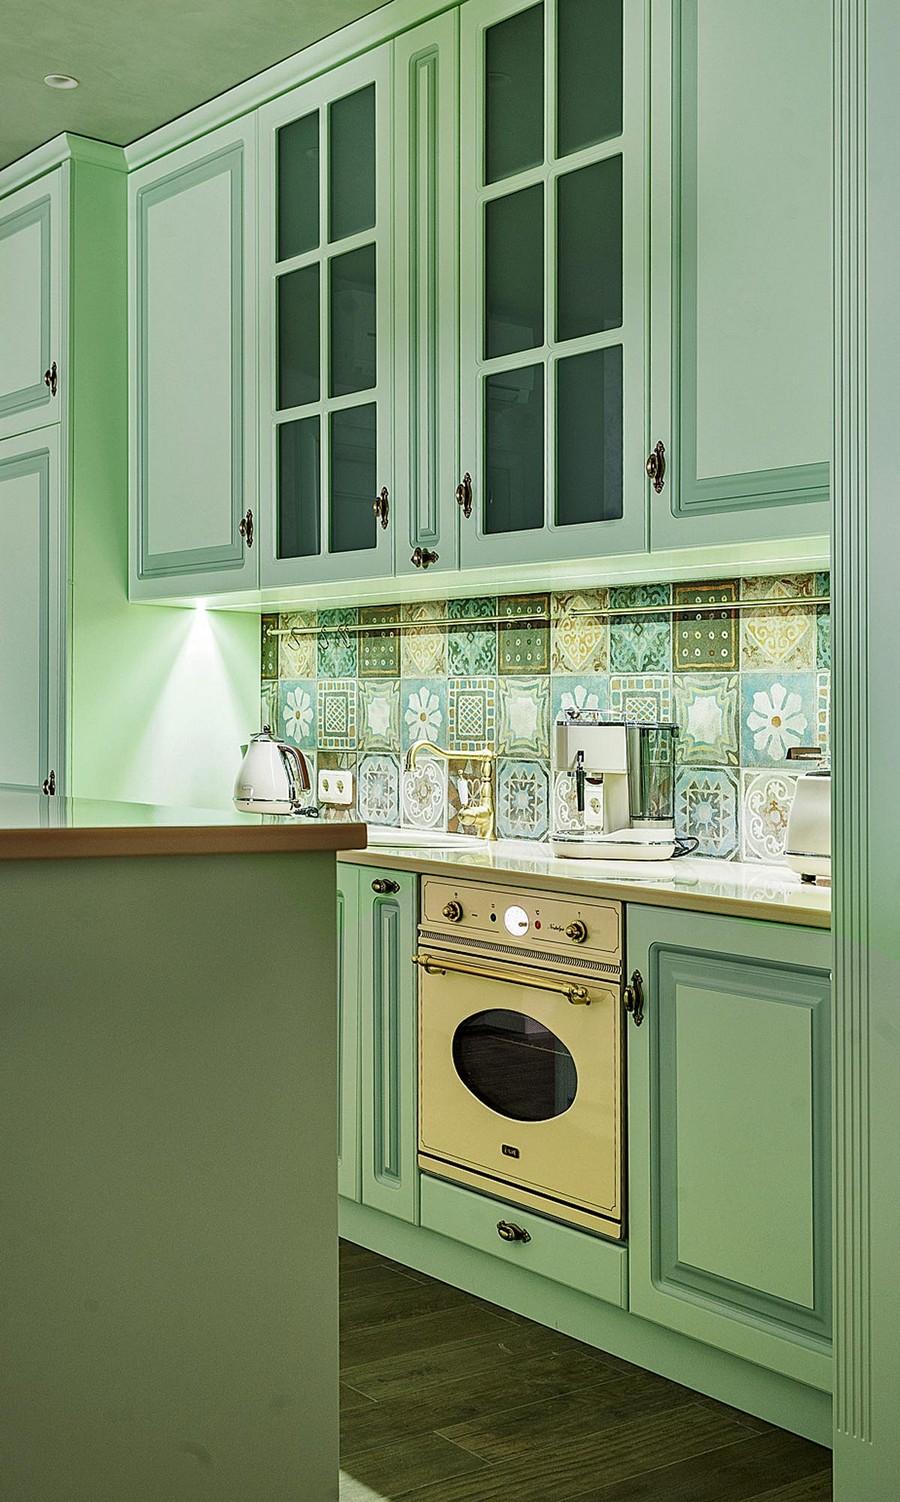 3-pale-mint-green-kitchen-interior-design-in-Mediterranean-style-island-soild-wood-cabinets-beige-worktop-cooker-hood-glass-cabinets-stove-brass-faucet-handles-rails-cheerful-square-tiles-backsplash-kettle